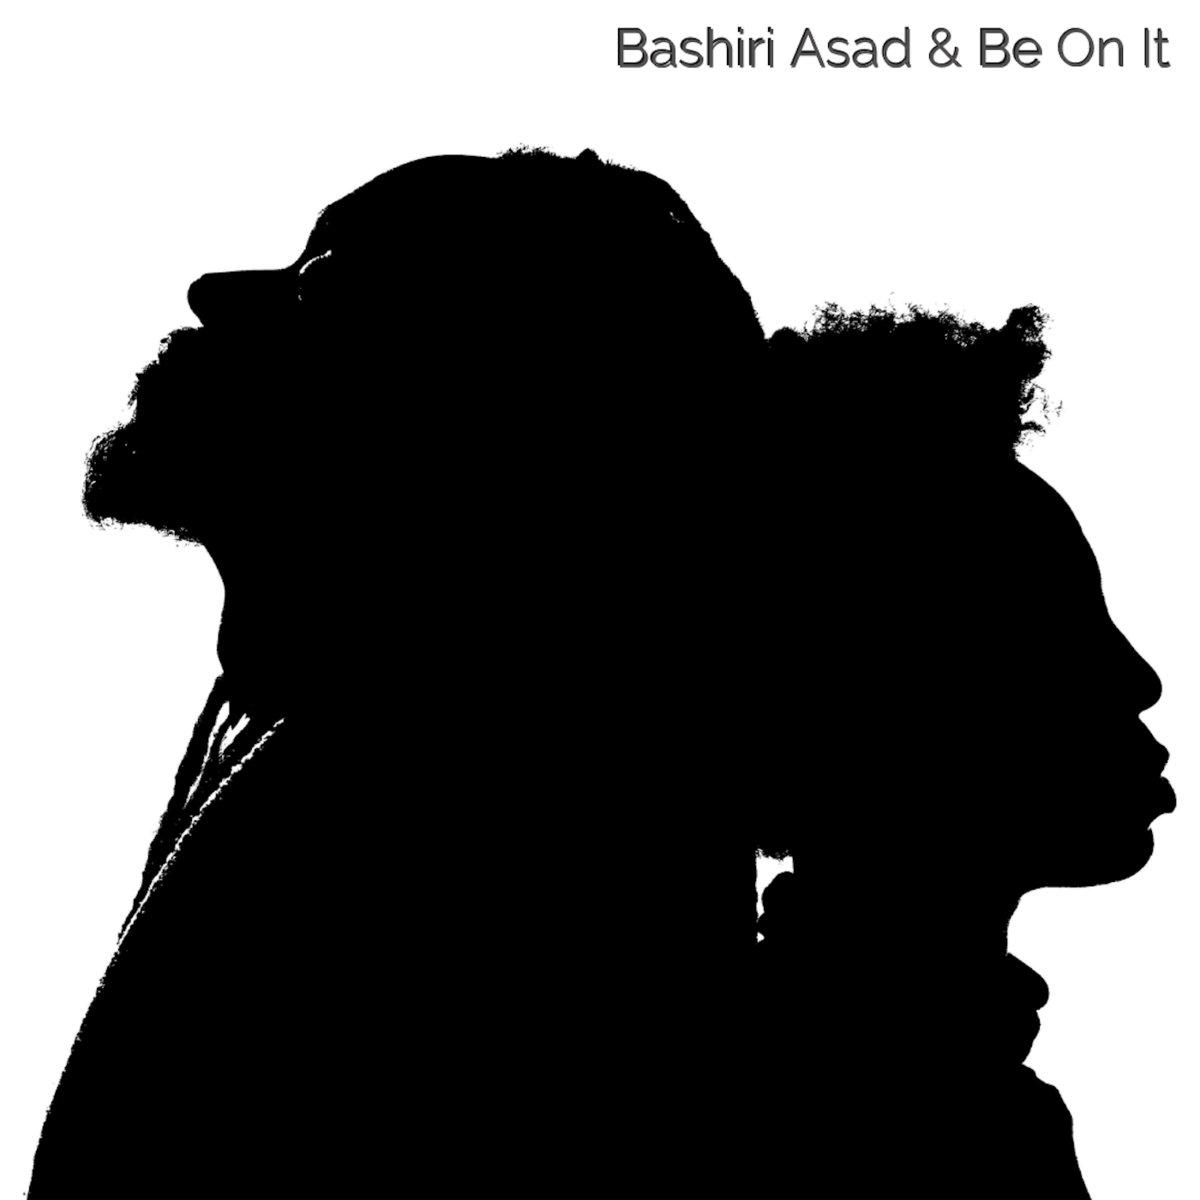 Bashiri Asad & Be On It | The Way We Are